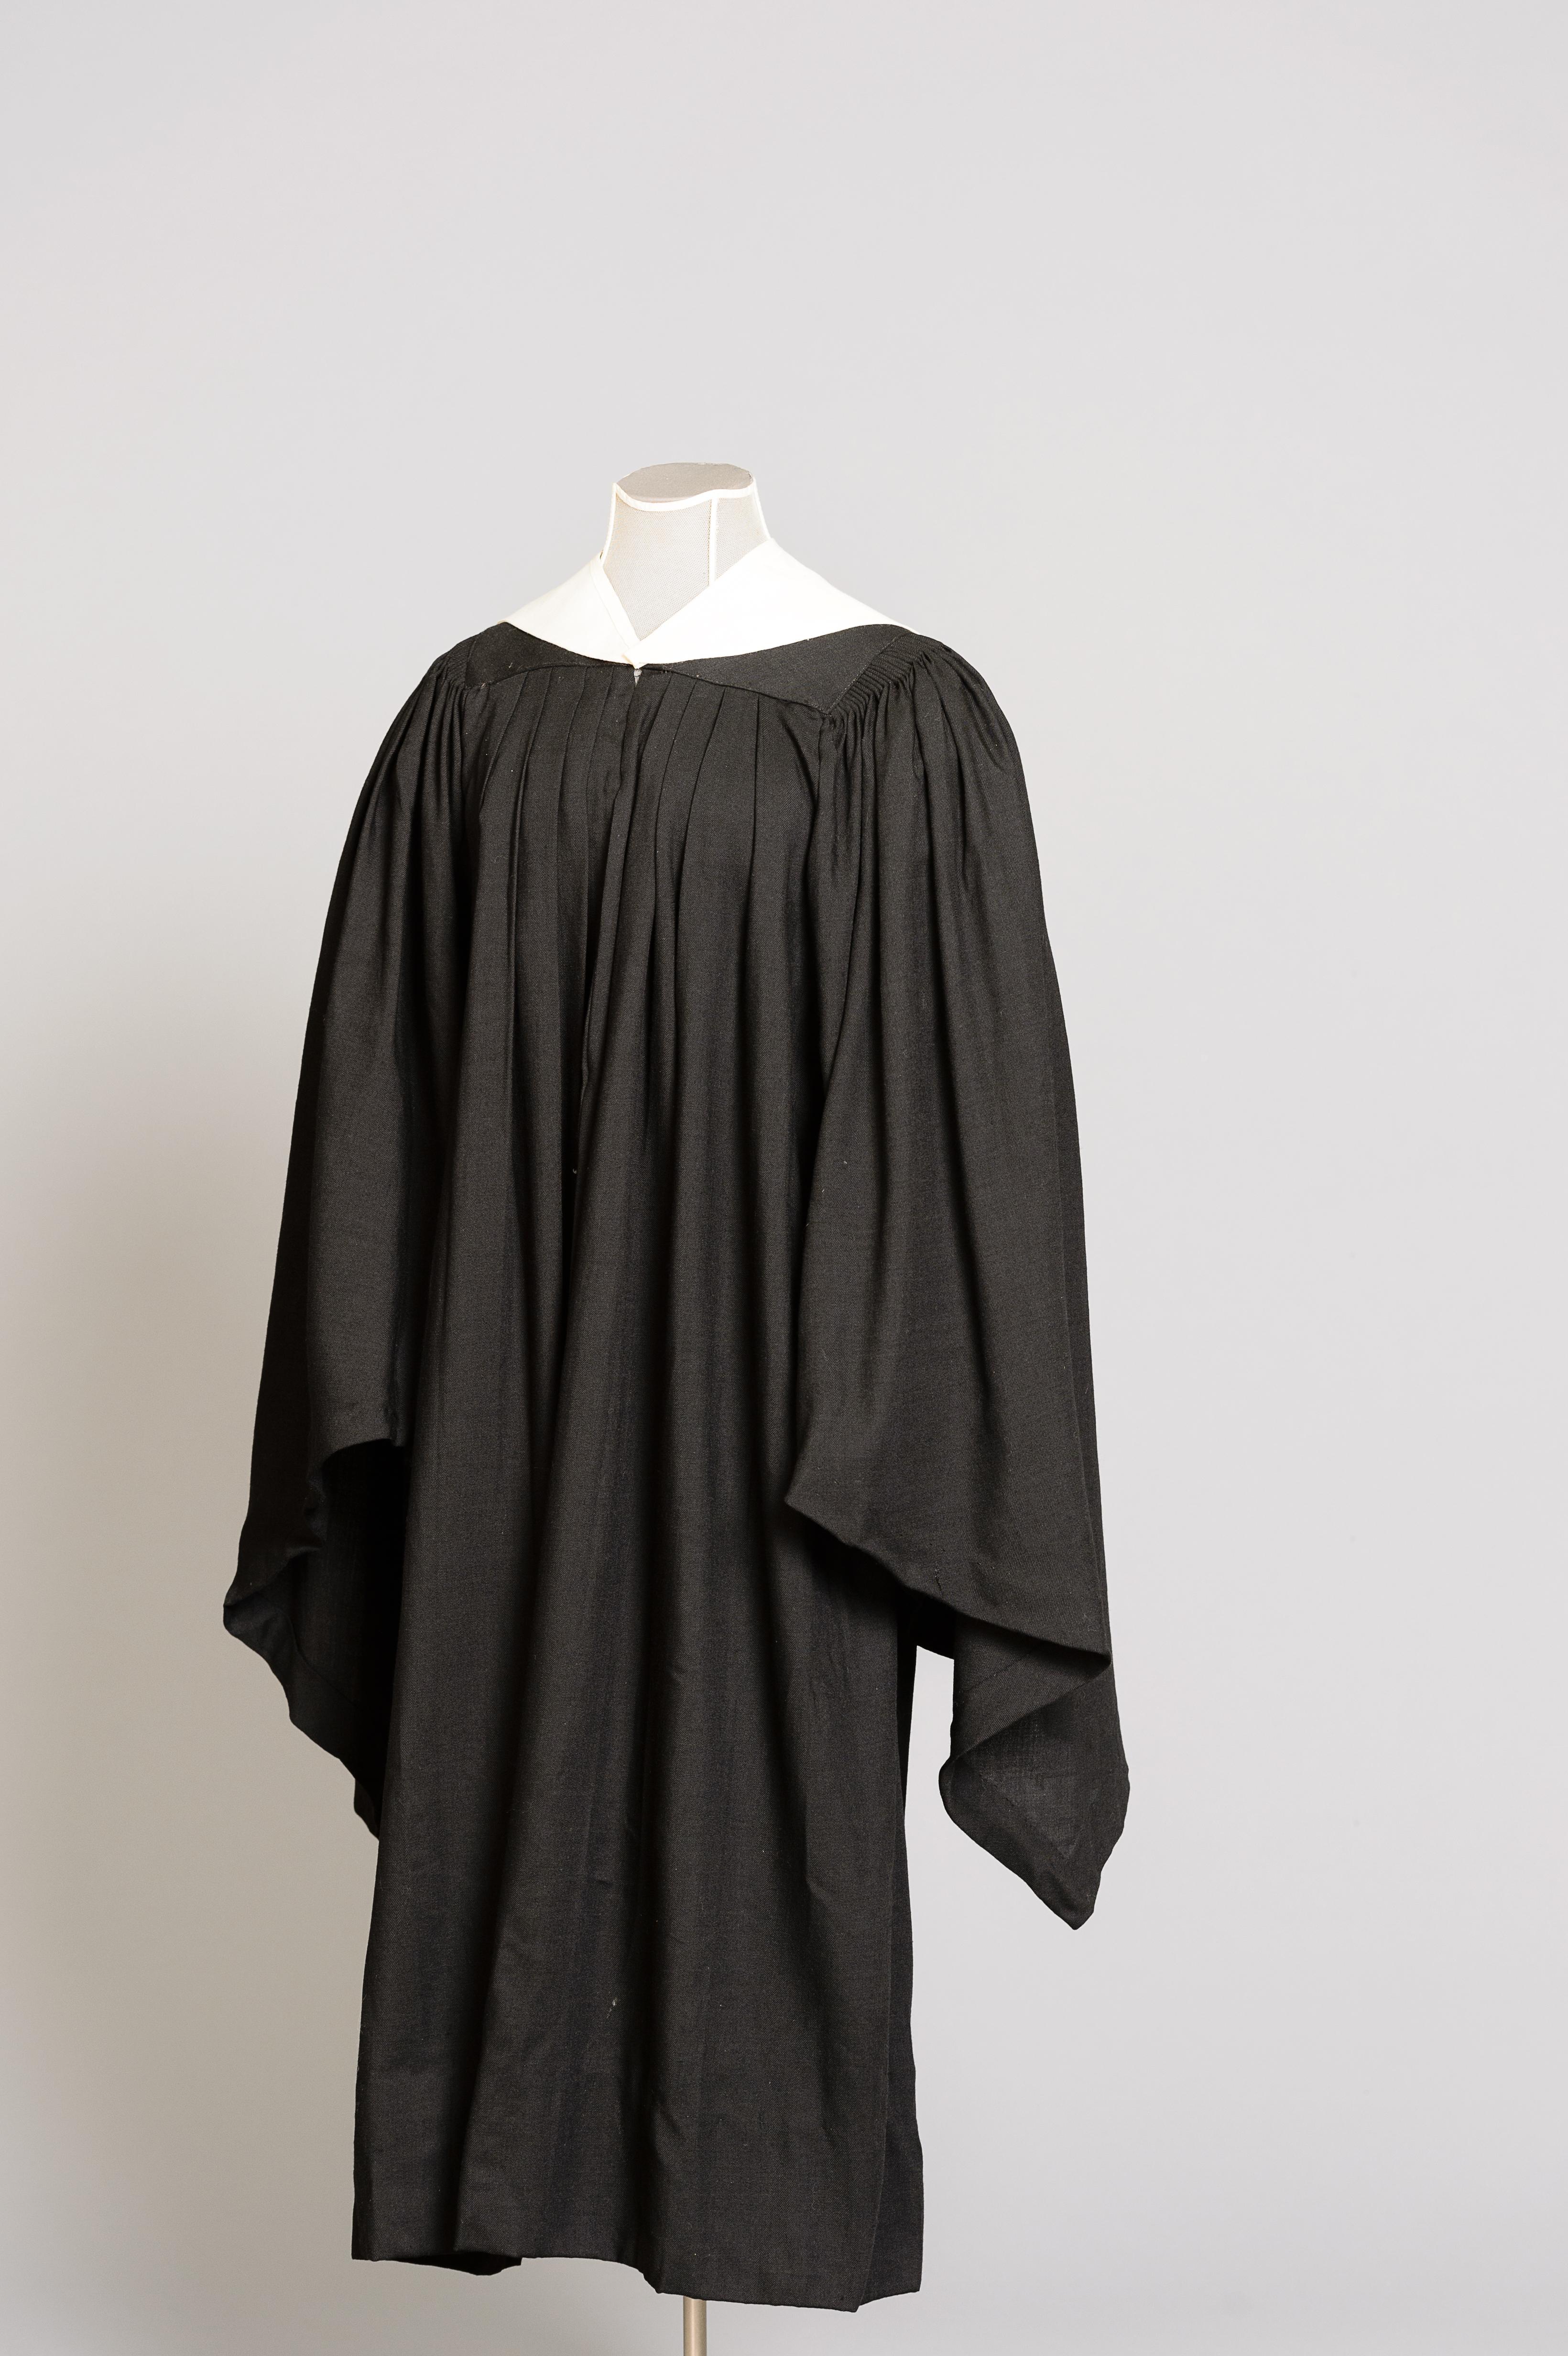 Fashion and Satire: Graduation Robe